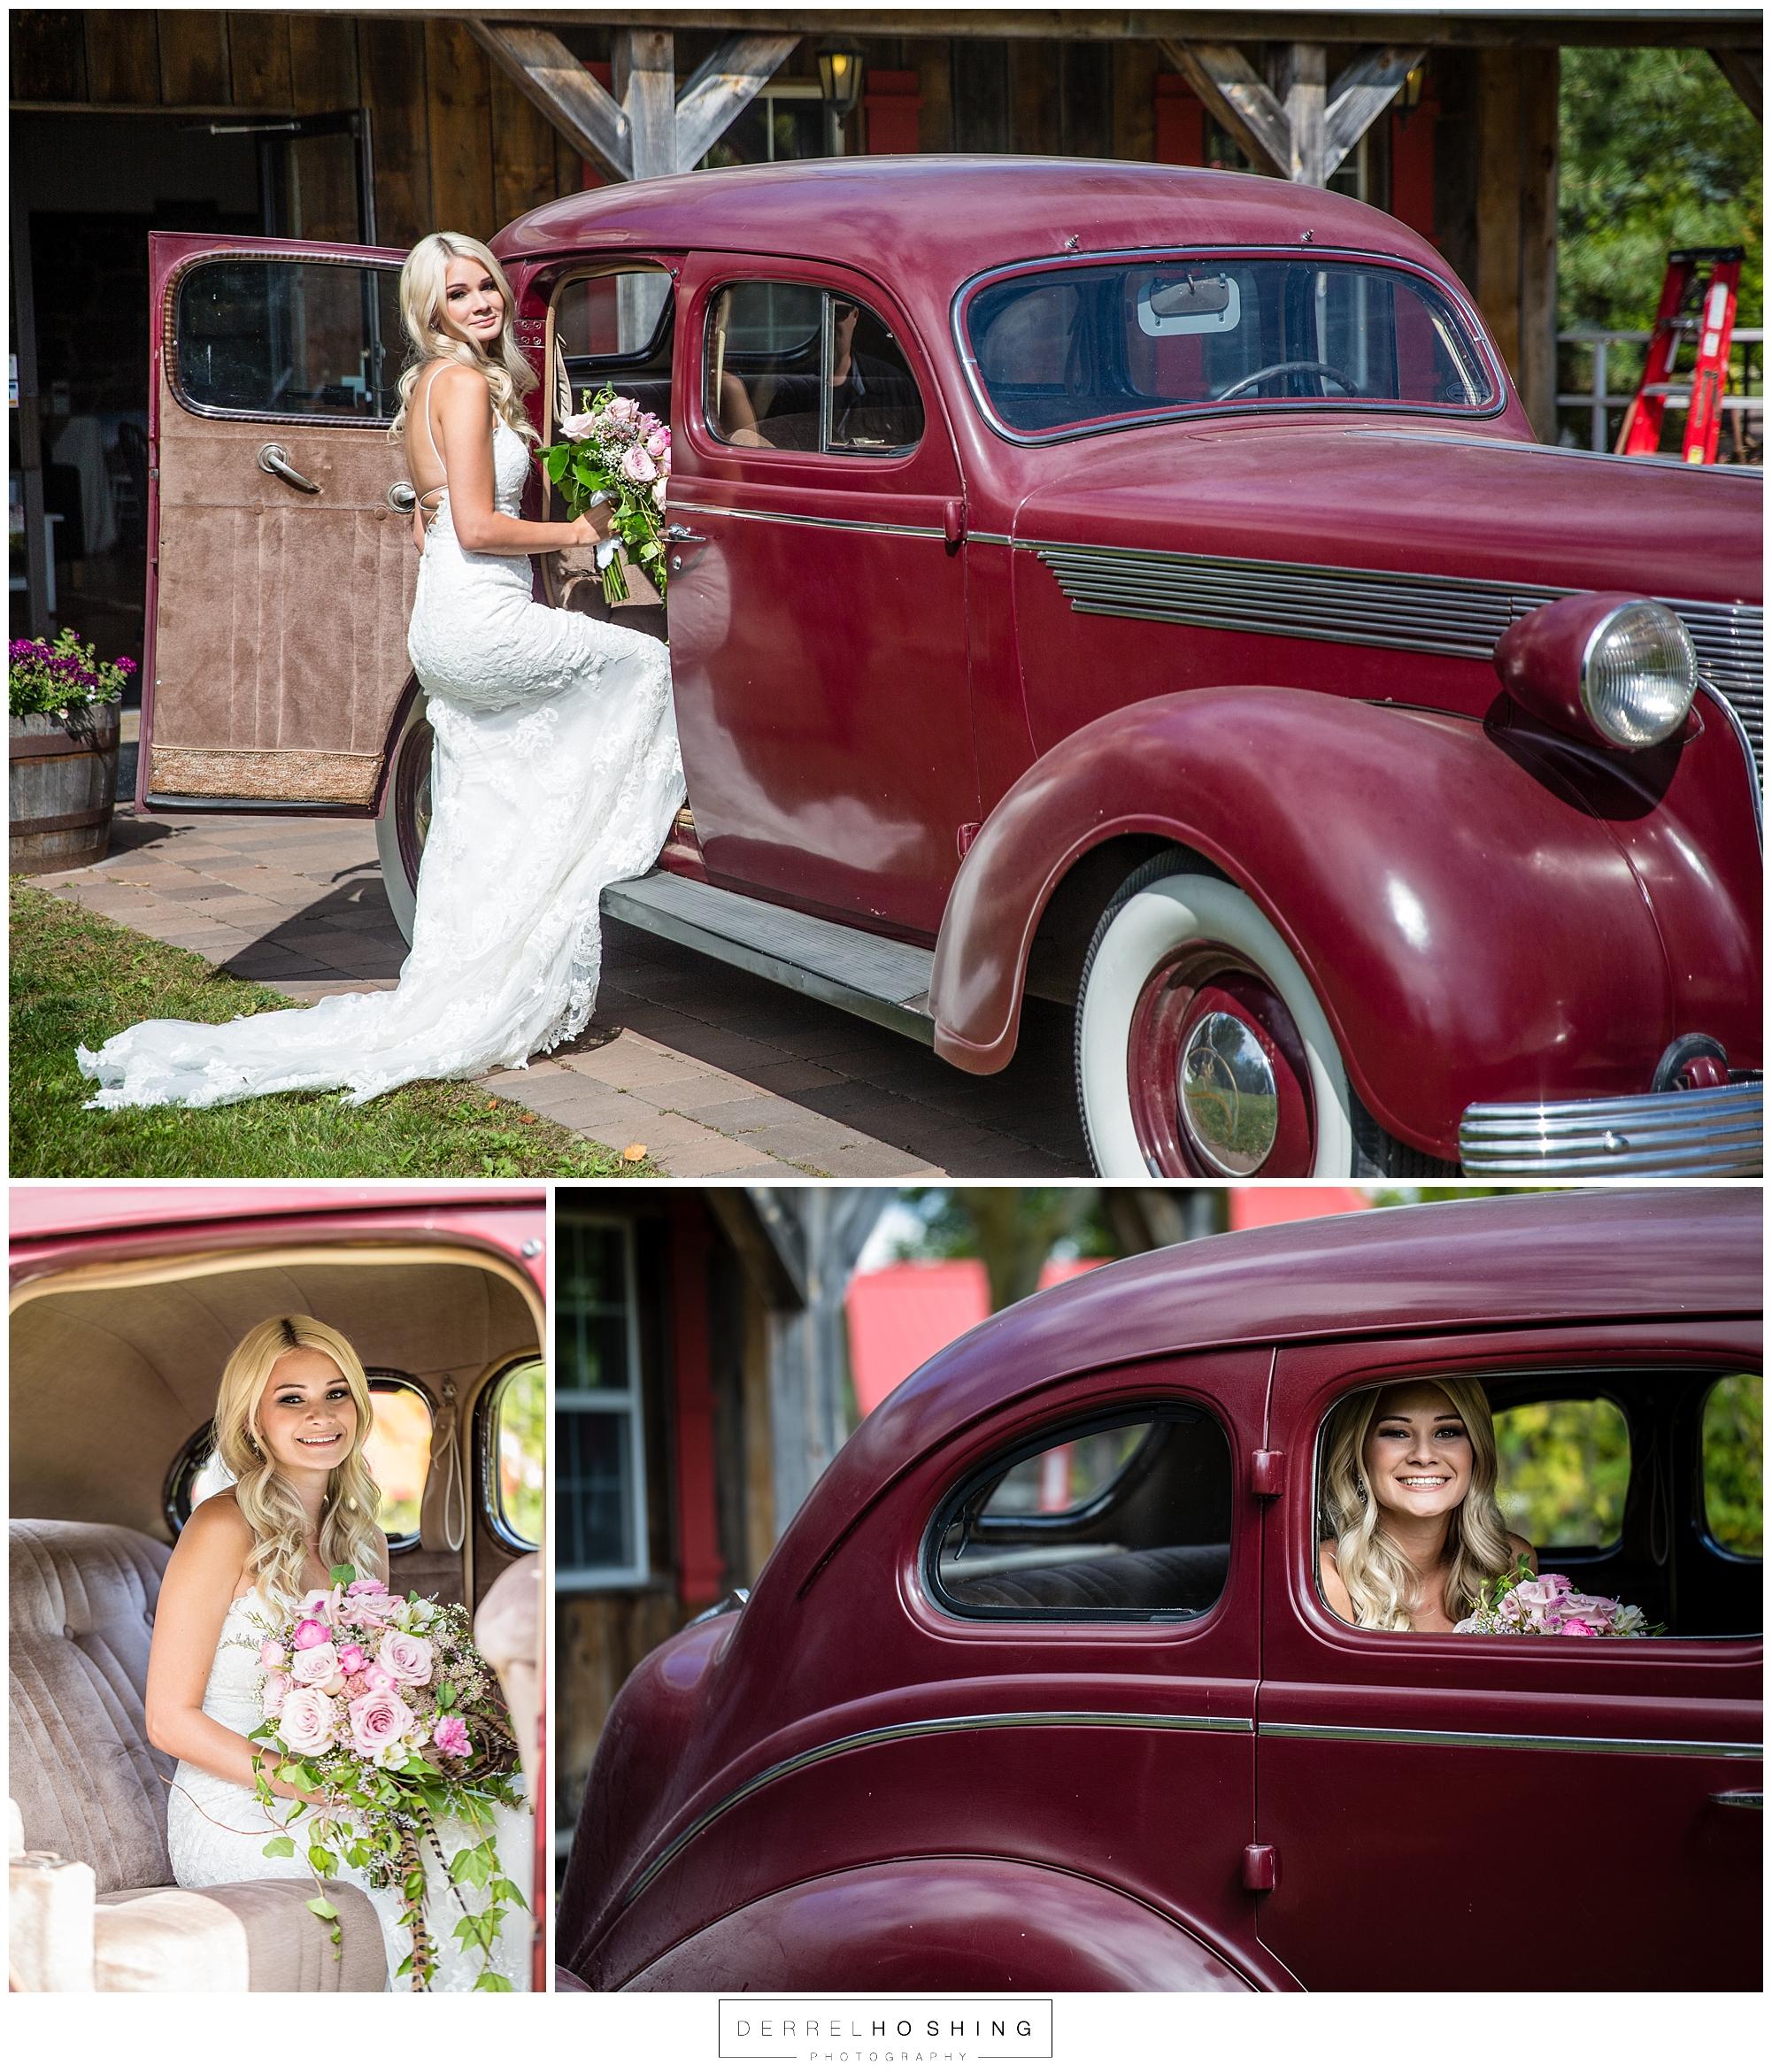 Belcroft-Estates-&-Event-Centre-Wedding-Innisfil-Ontario-0007.jpg